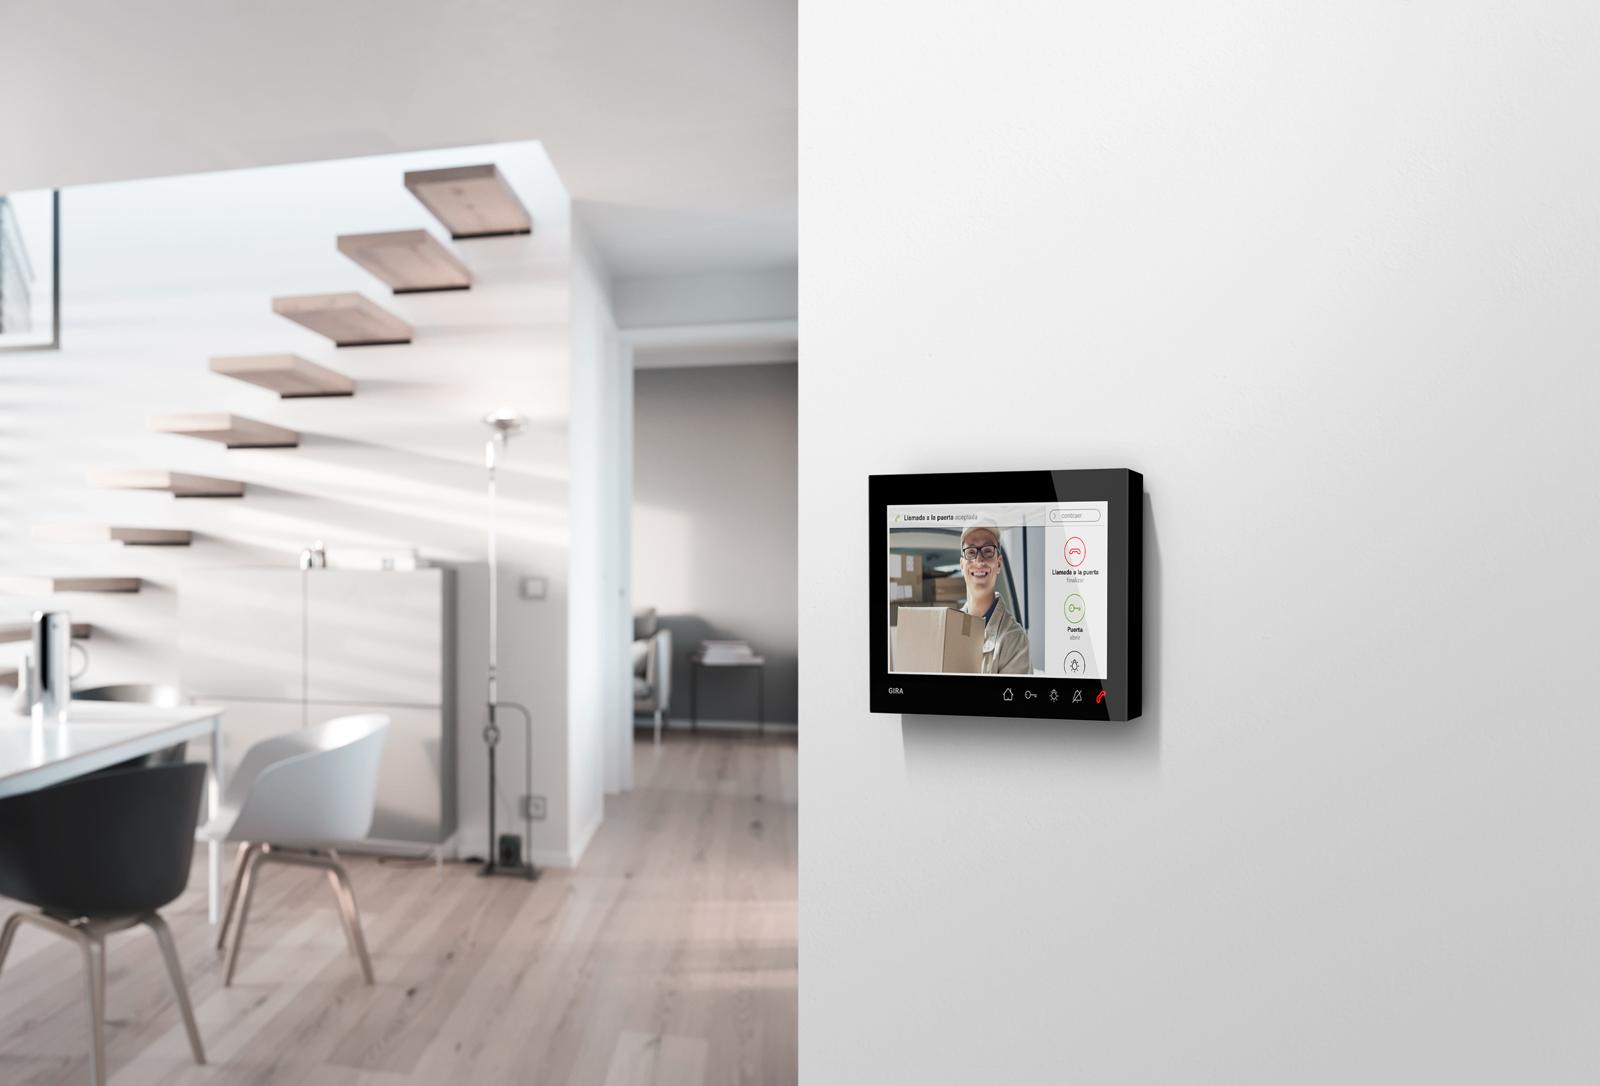 Gira Produkt Wohnungsstation Video AP7 Schwarz